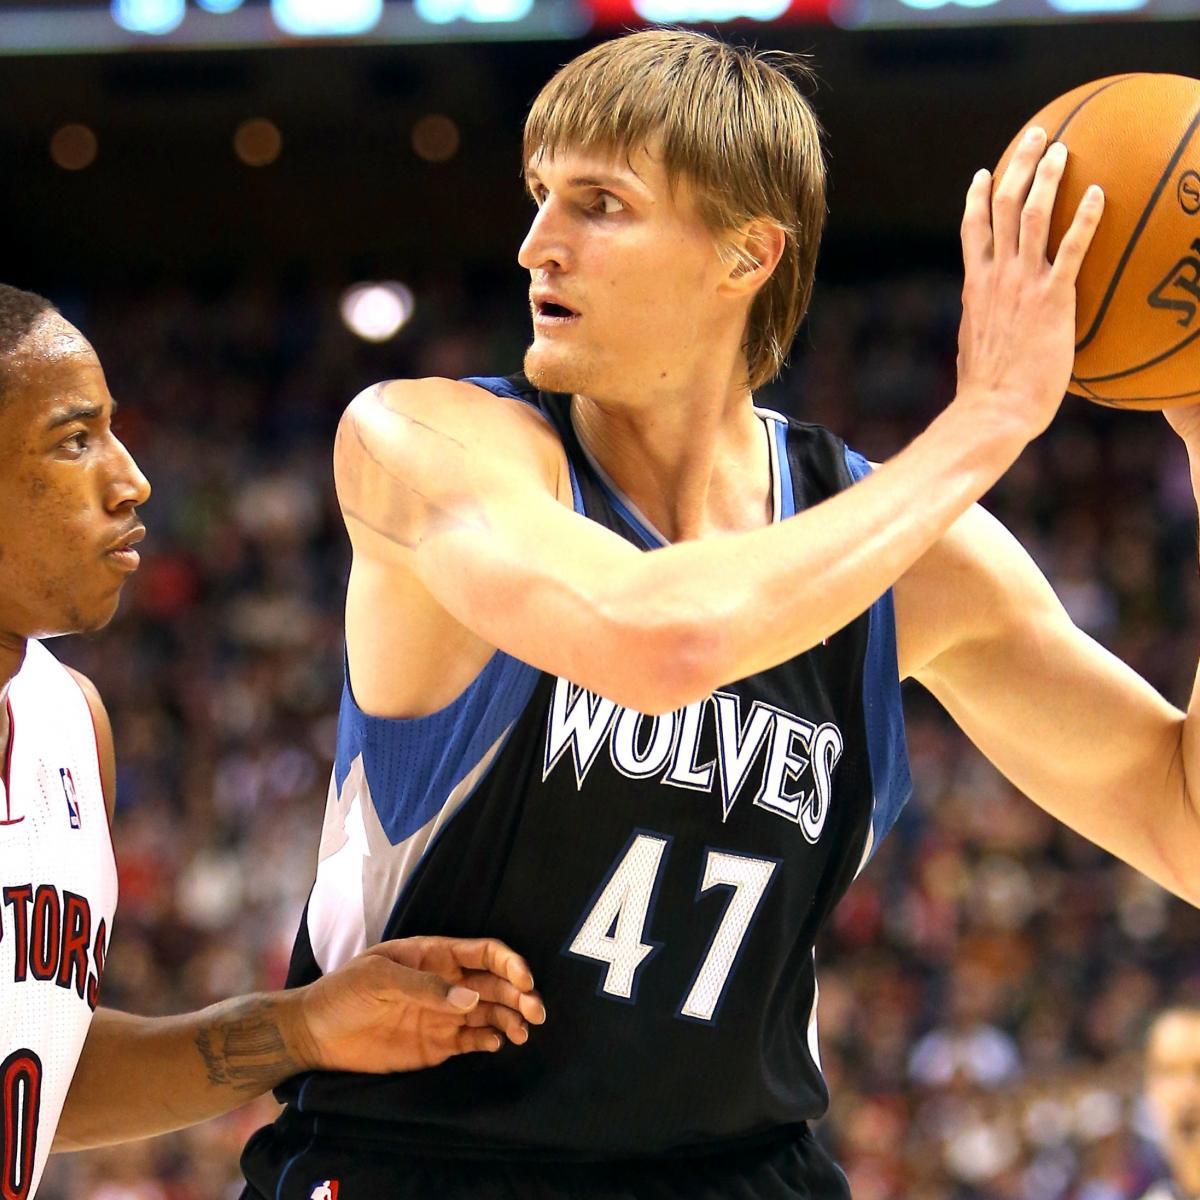 865e45b5a388 Ranking Biggest Early Surprises of the 2012-13 NBA Season